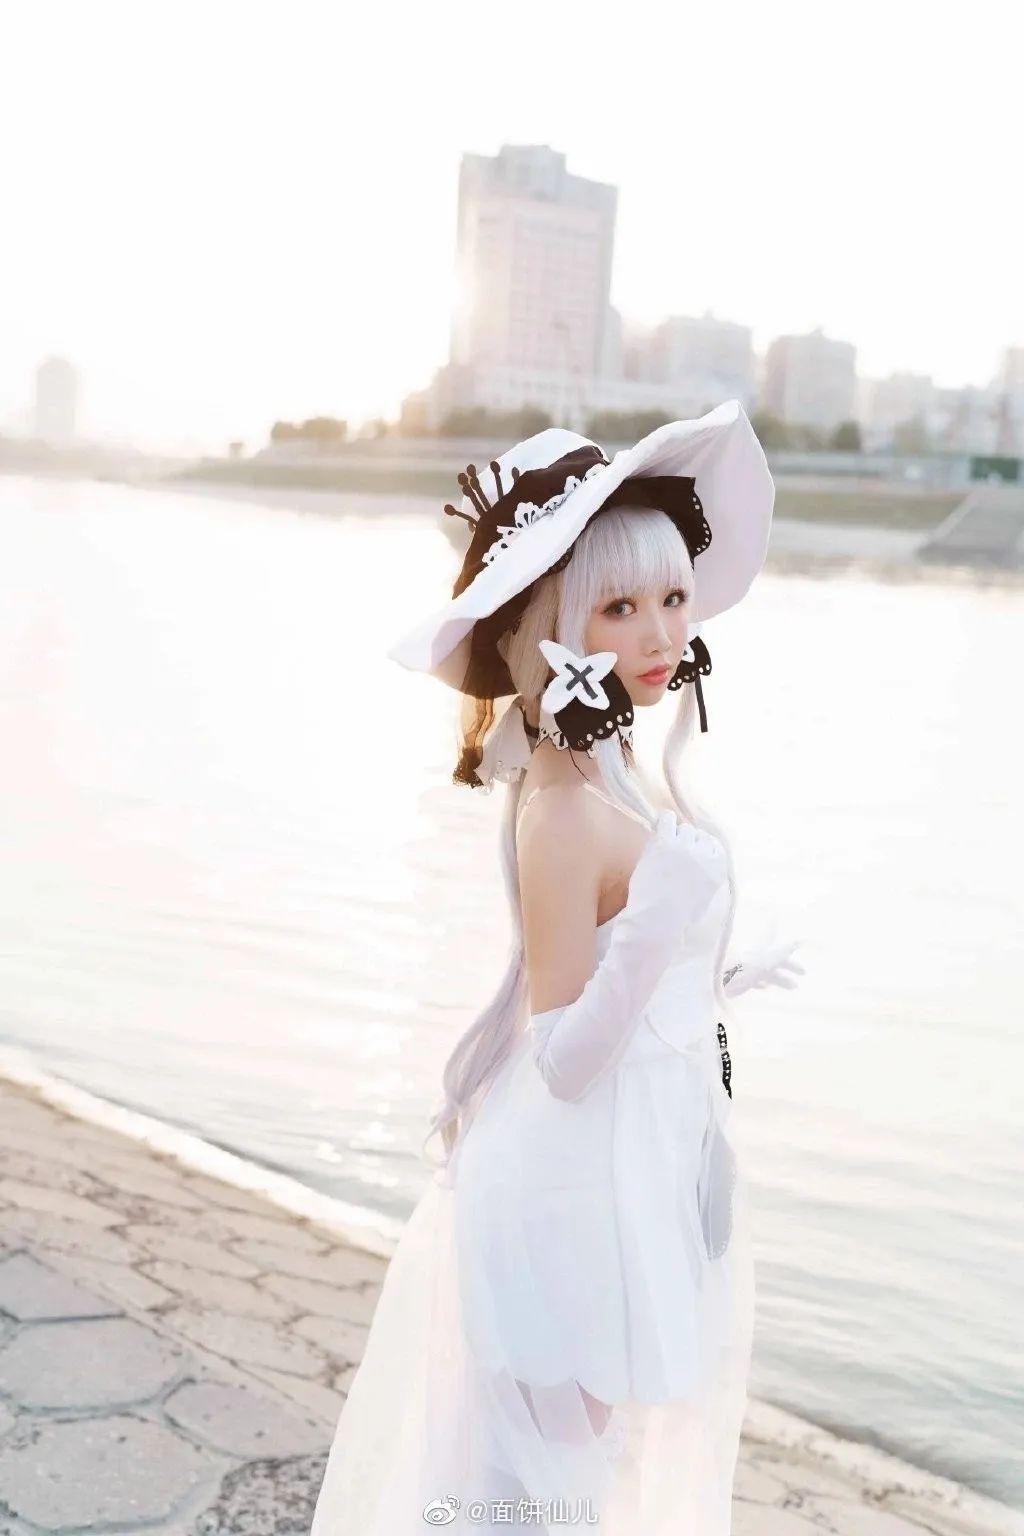 COSPLAY |  碧海航线cos 御姐范十足